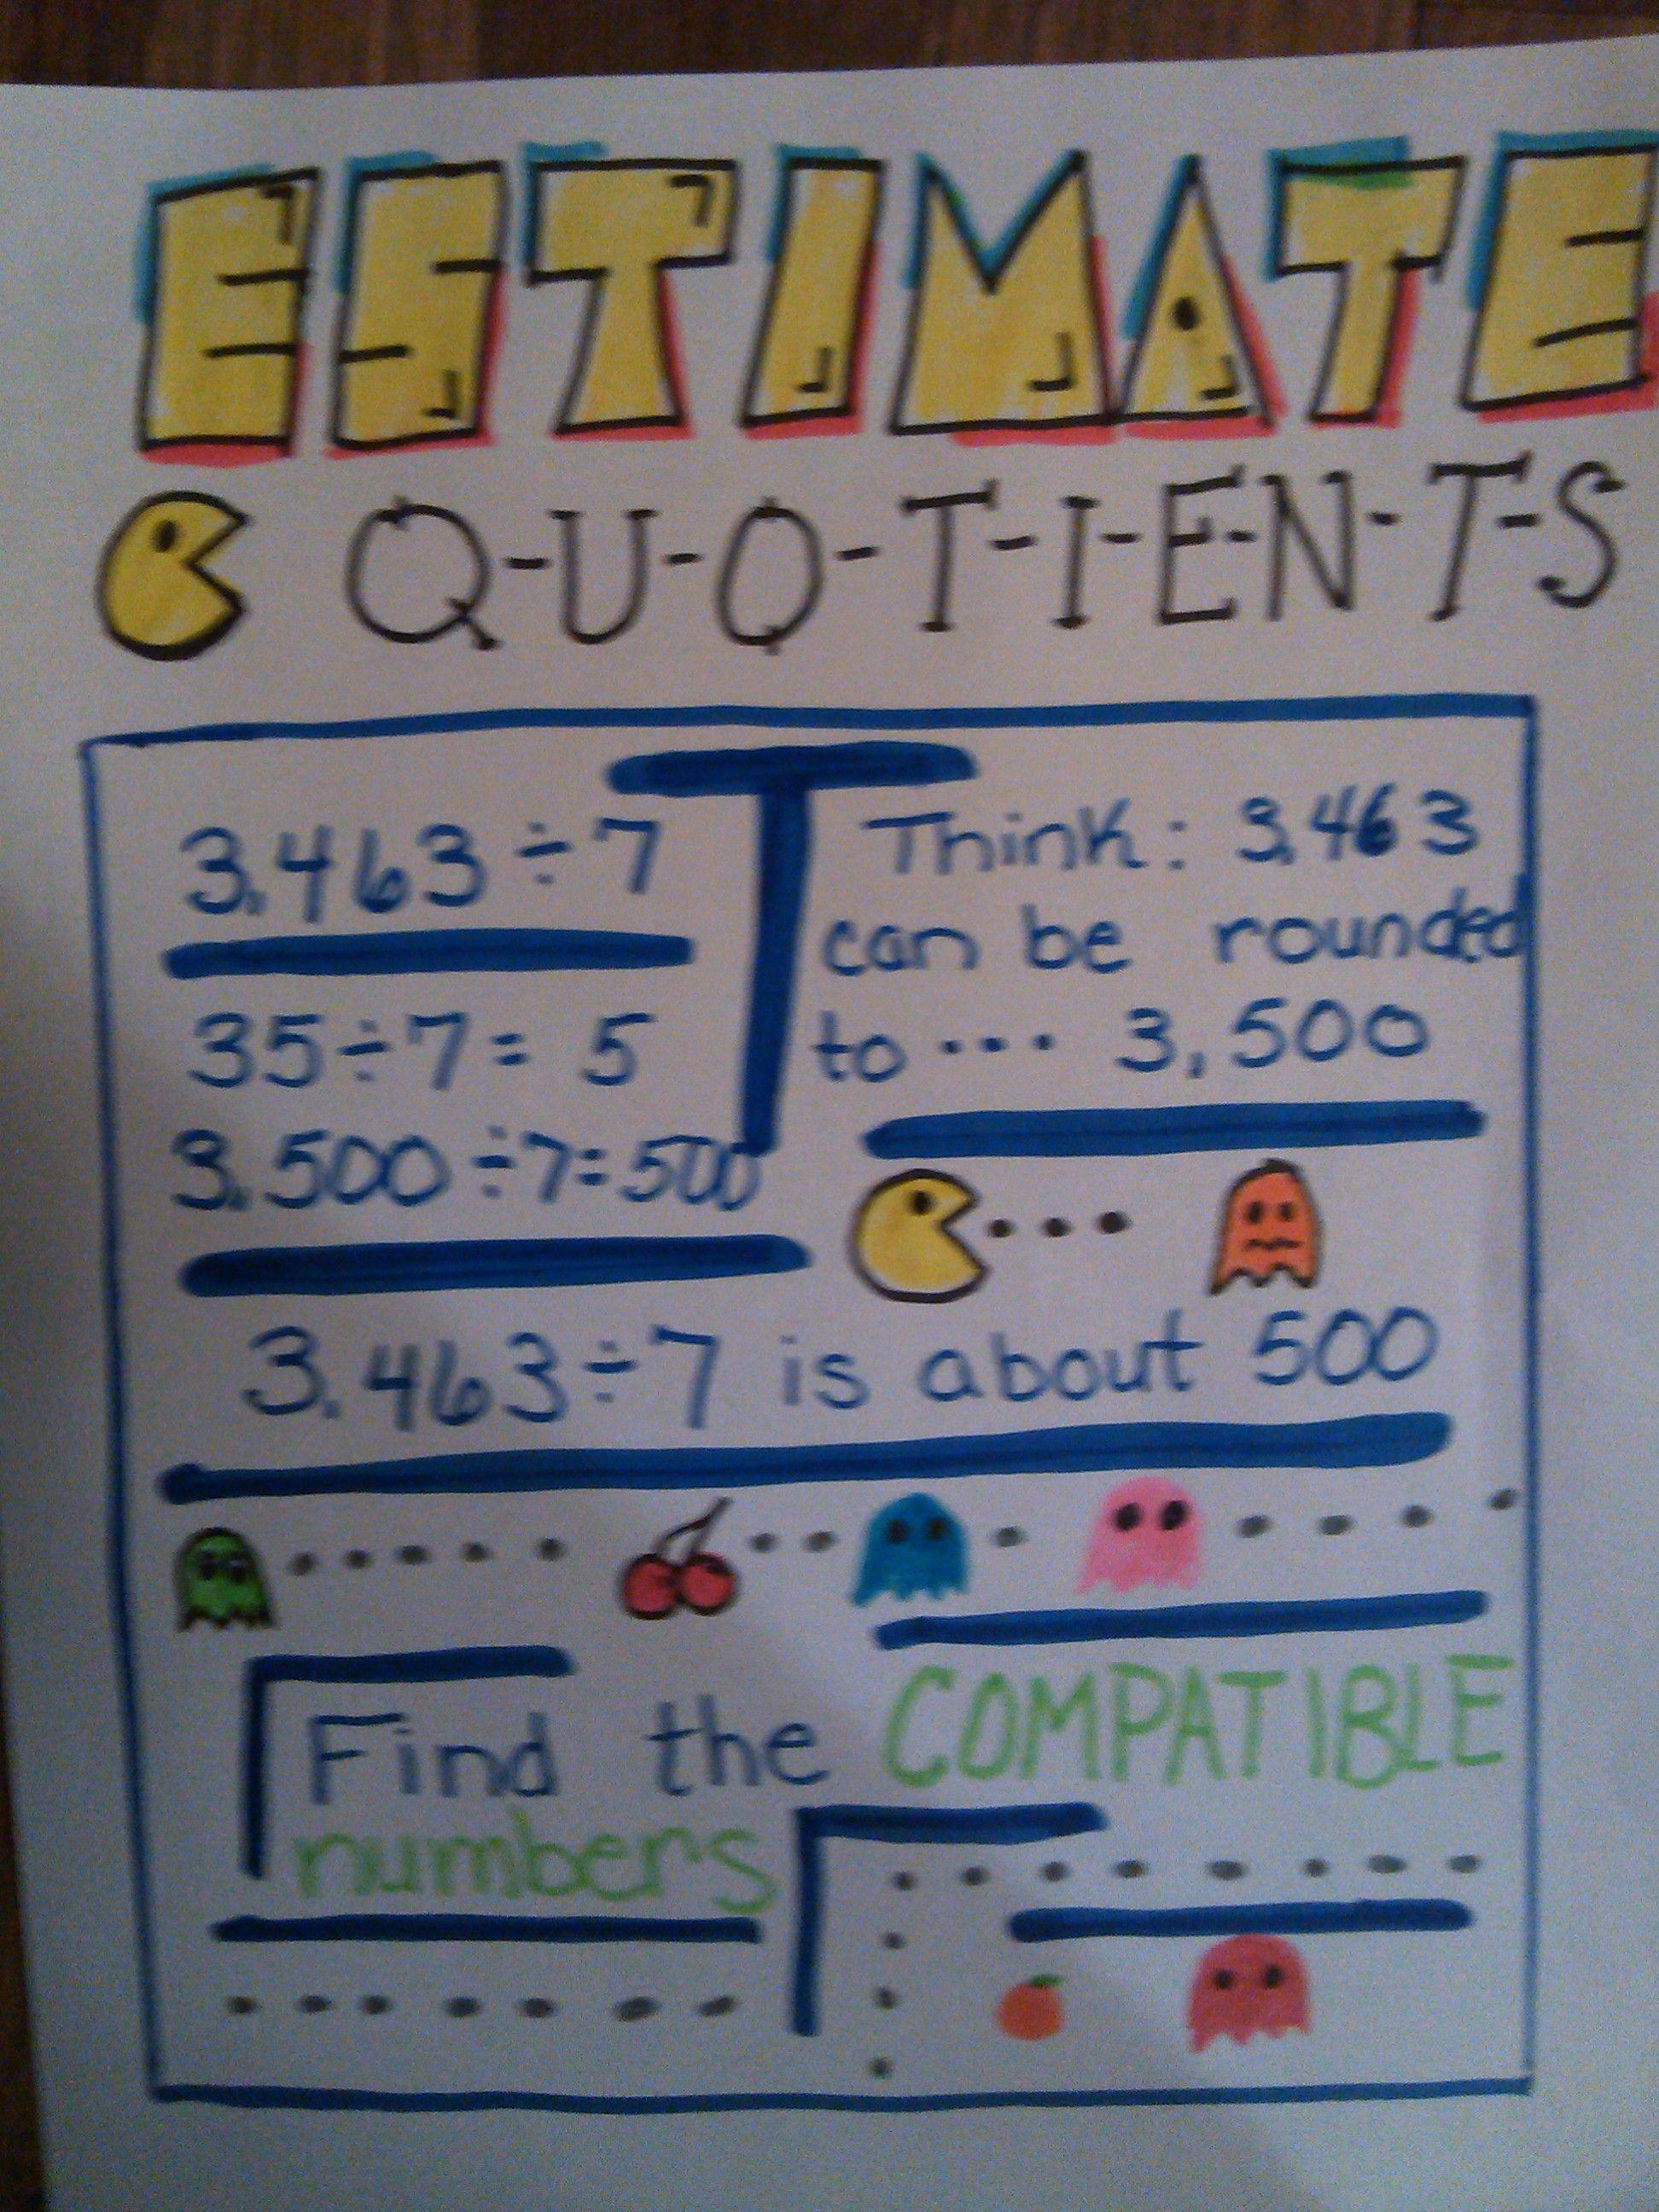 Estimate Quotients Anchor Chart Estimating Quotients 5th Grade Worksheets 4th Grade Math In 2021 Estimating Quotients 5th Grade Worksheets Kids Math Worksheets Estimating quotients worksheets 5th